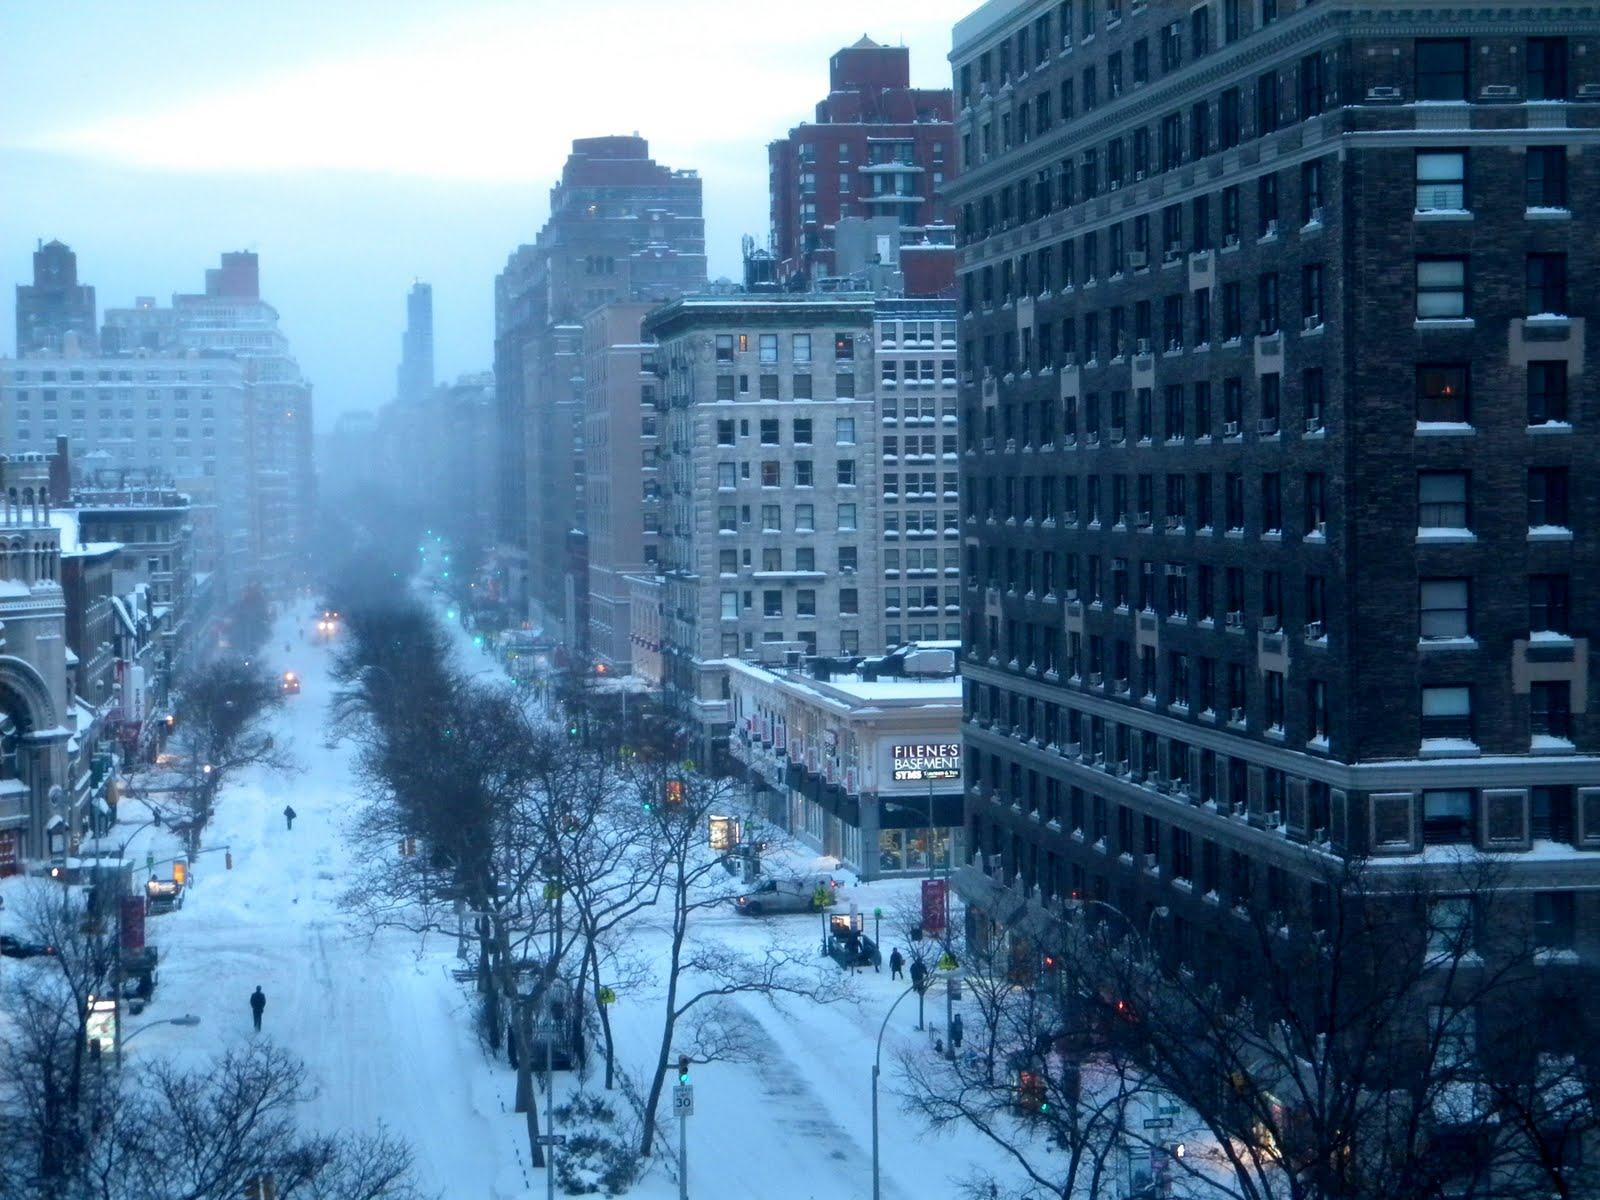 Winter in new york city wallpaper Wallpaper Wide HD 1600x1200